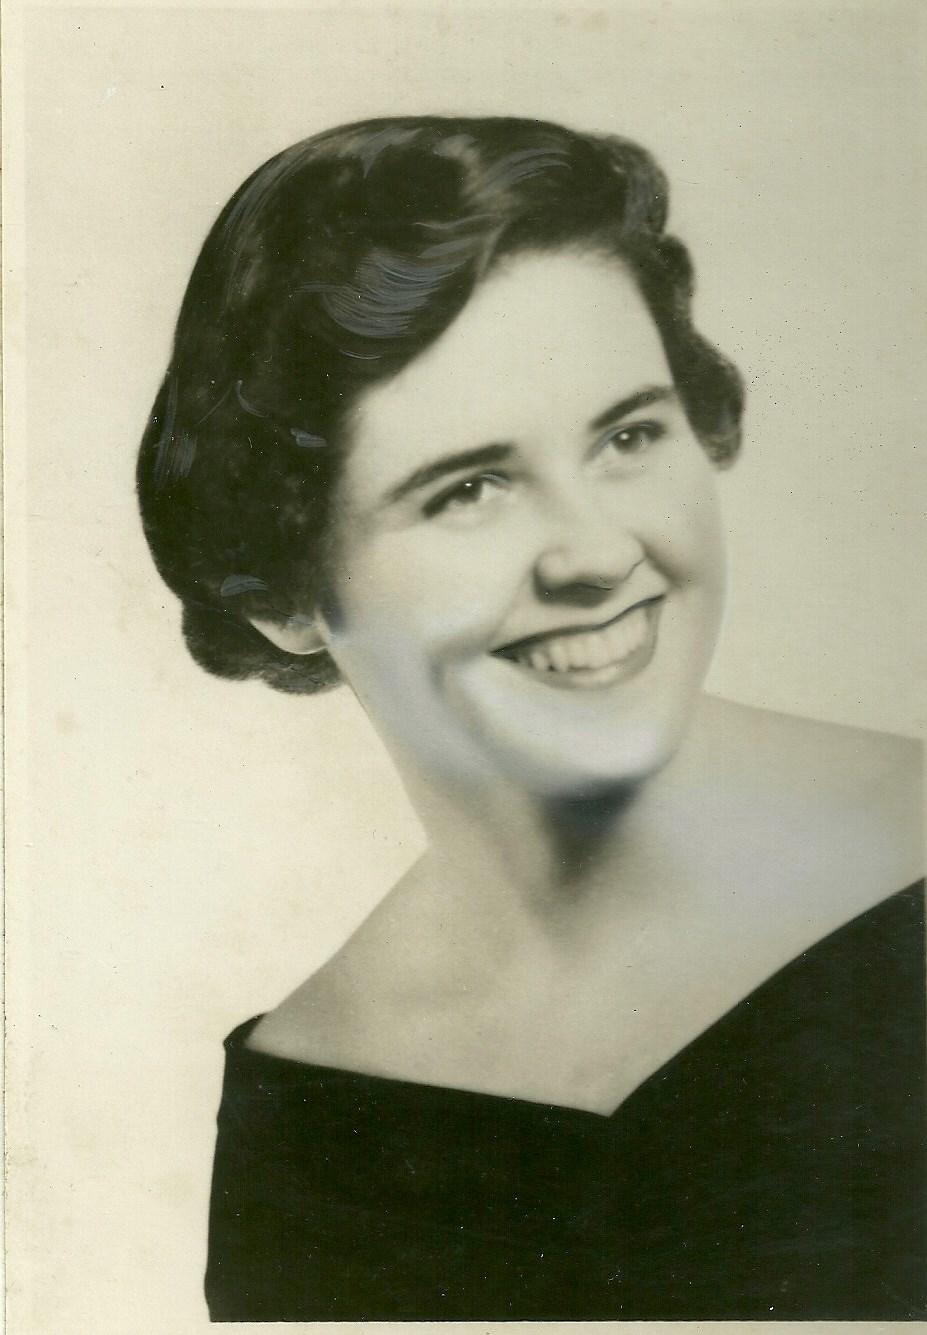 Charlene Gonzales (b. 1974) forecast